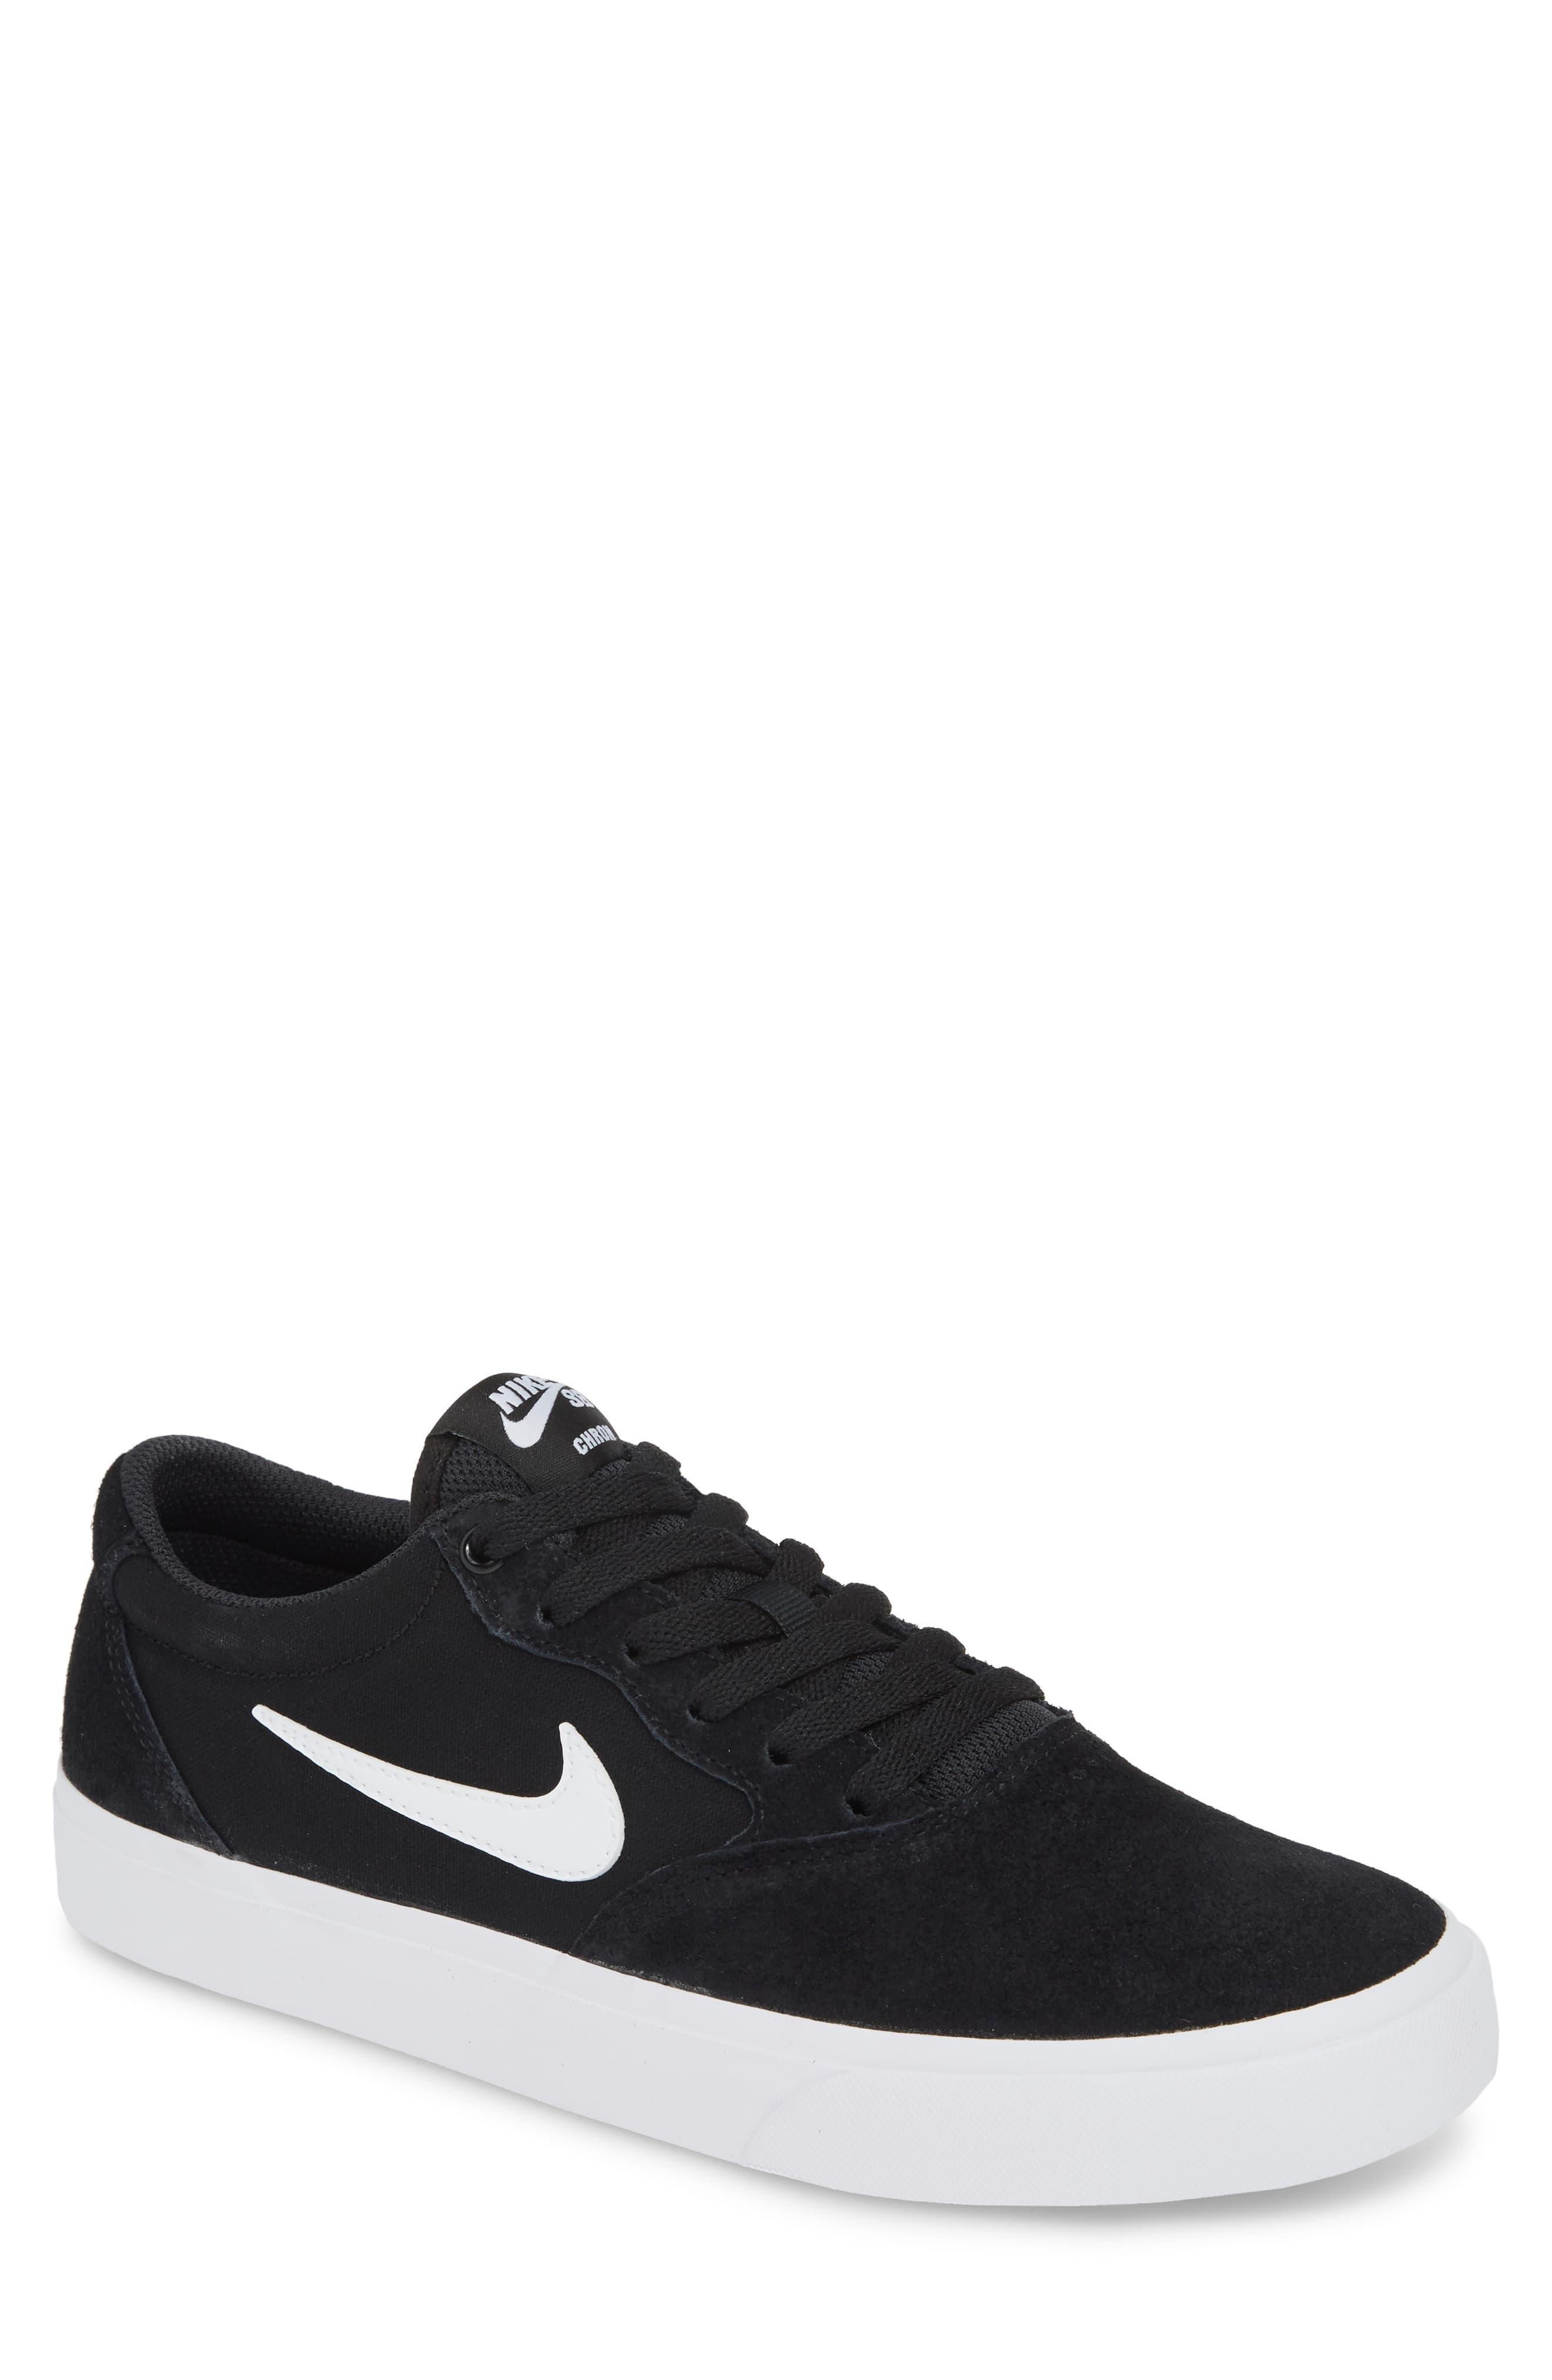 Nike SB Chron Solarsoft Skate Shoe